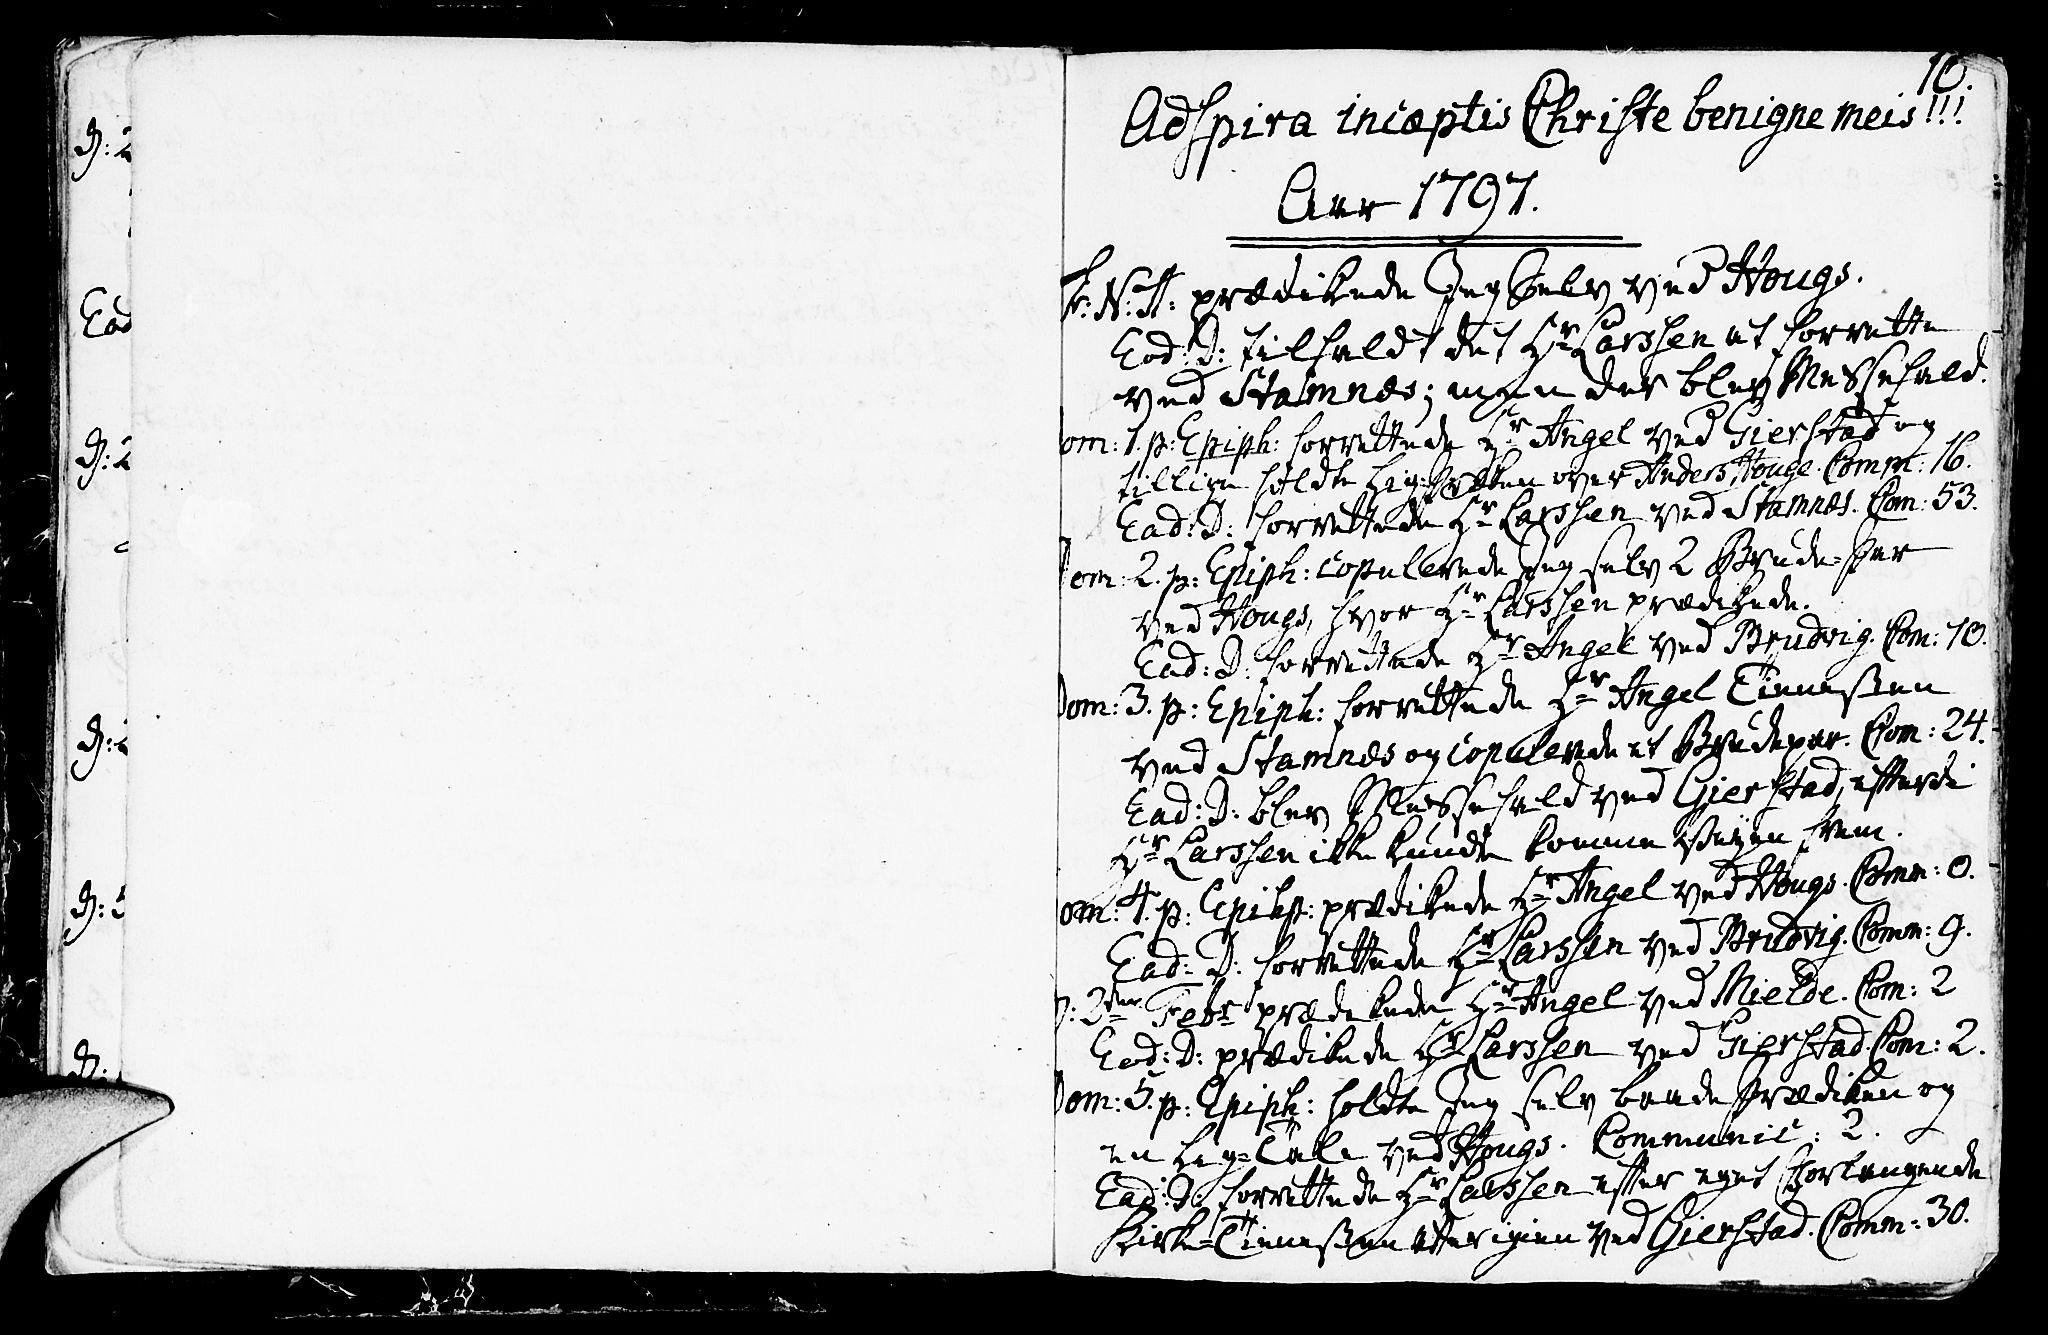 SAB, Haus sokneprestembete, H/Haa: Parish register (official) no. A 11, 1796-1816, p. 10